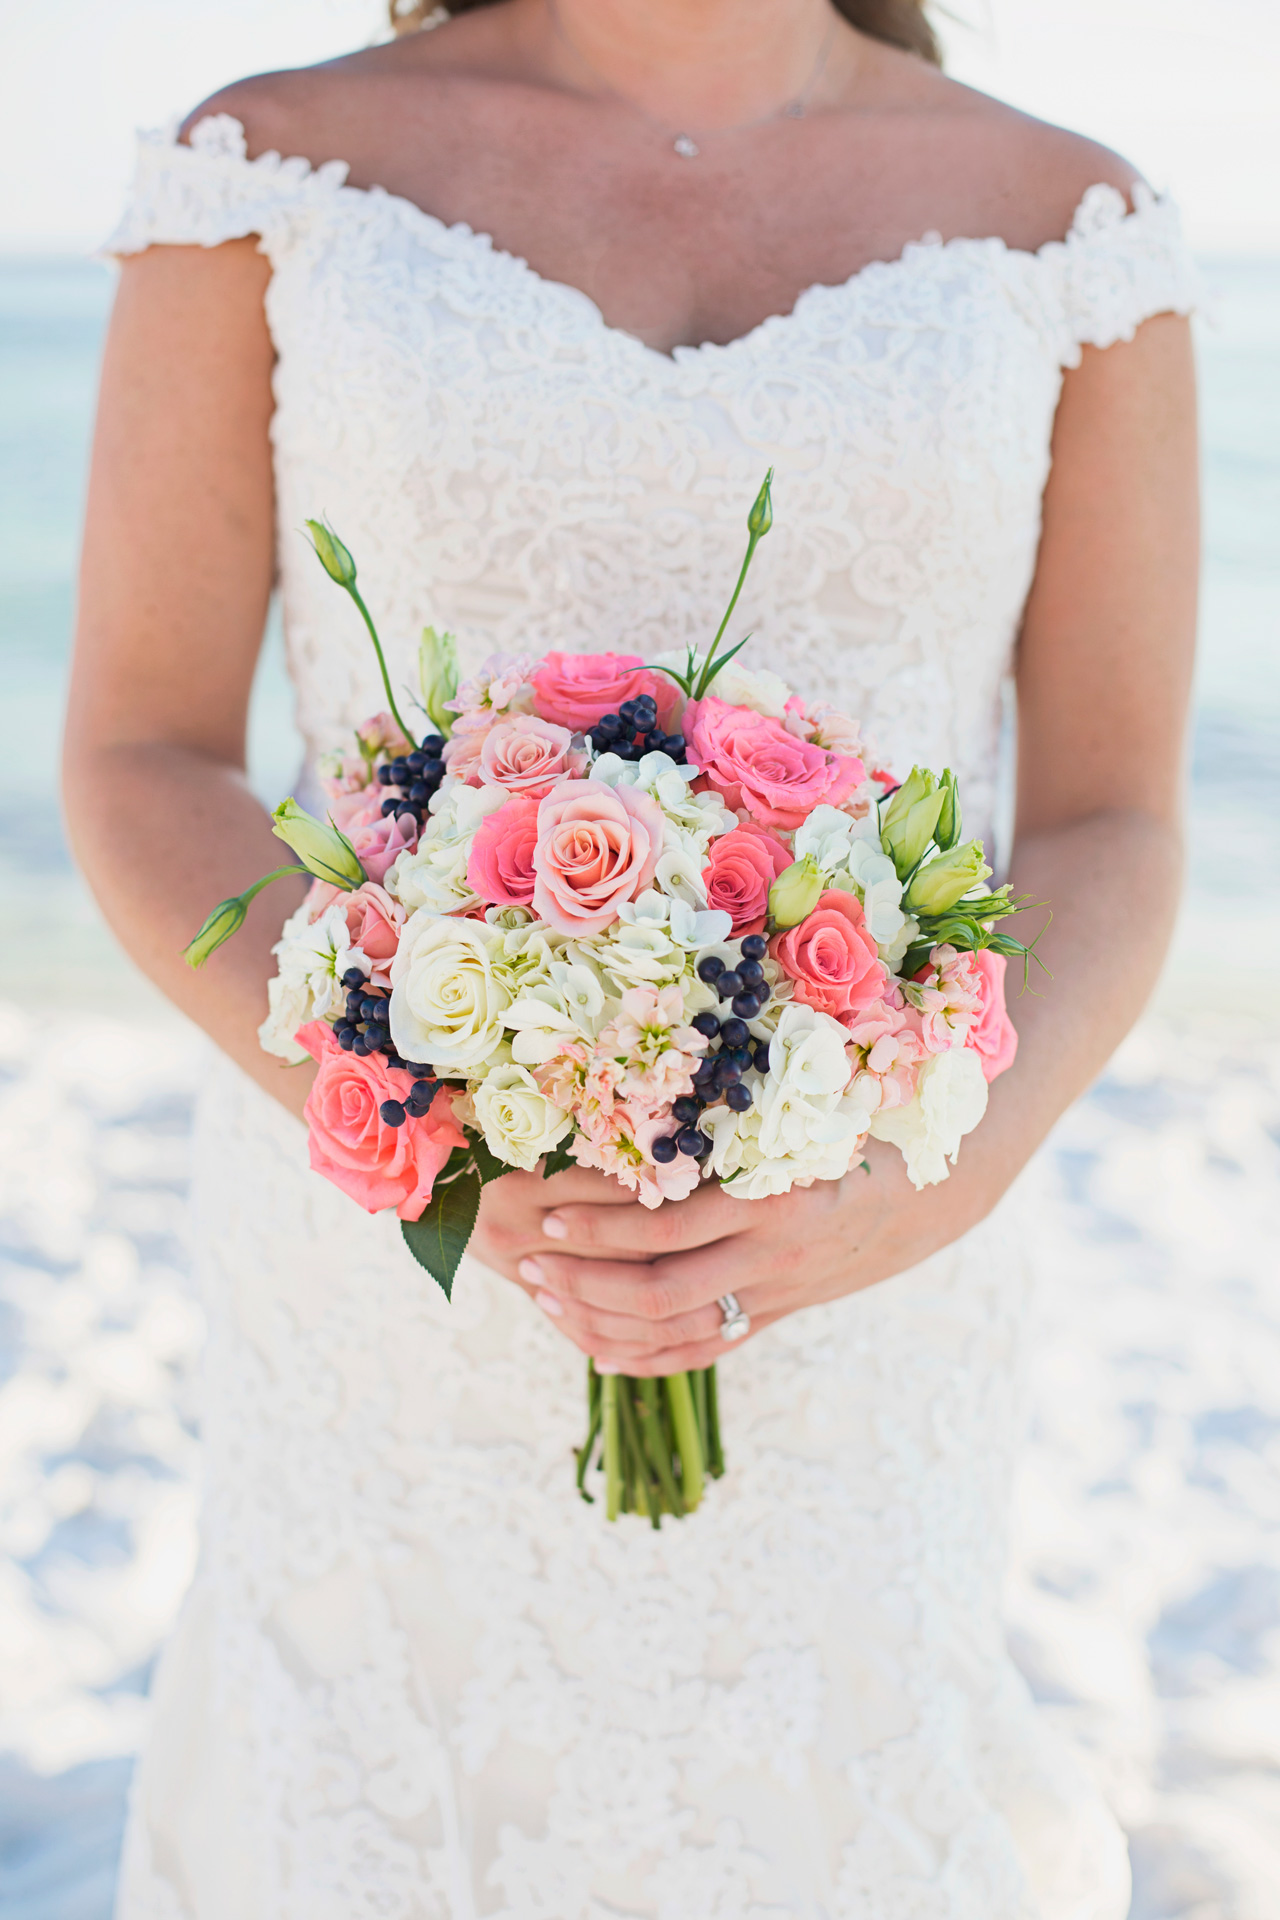 Florida Destination Wedding At Hilton Sandestin Inspired By The Sea